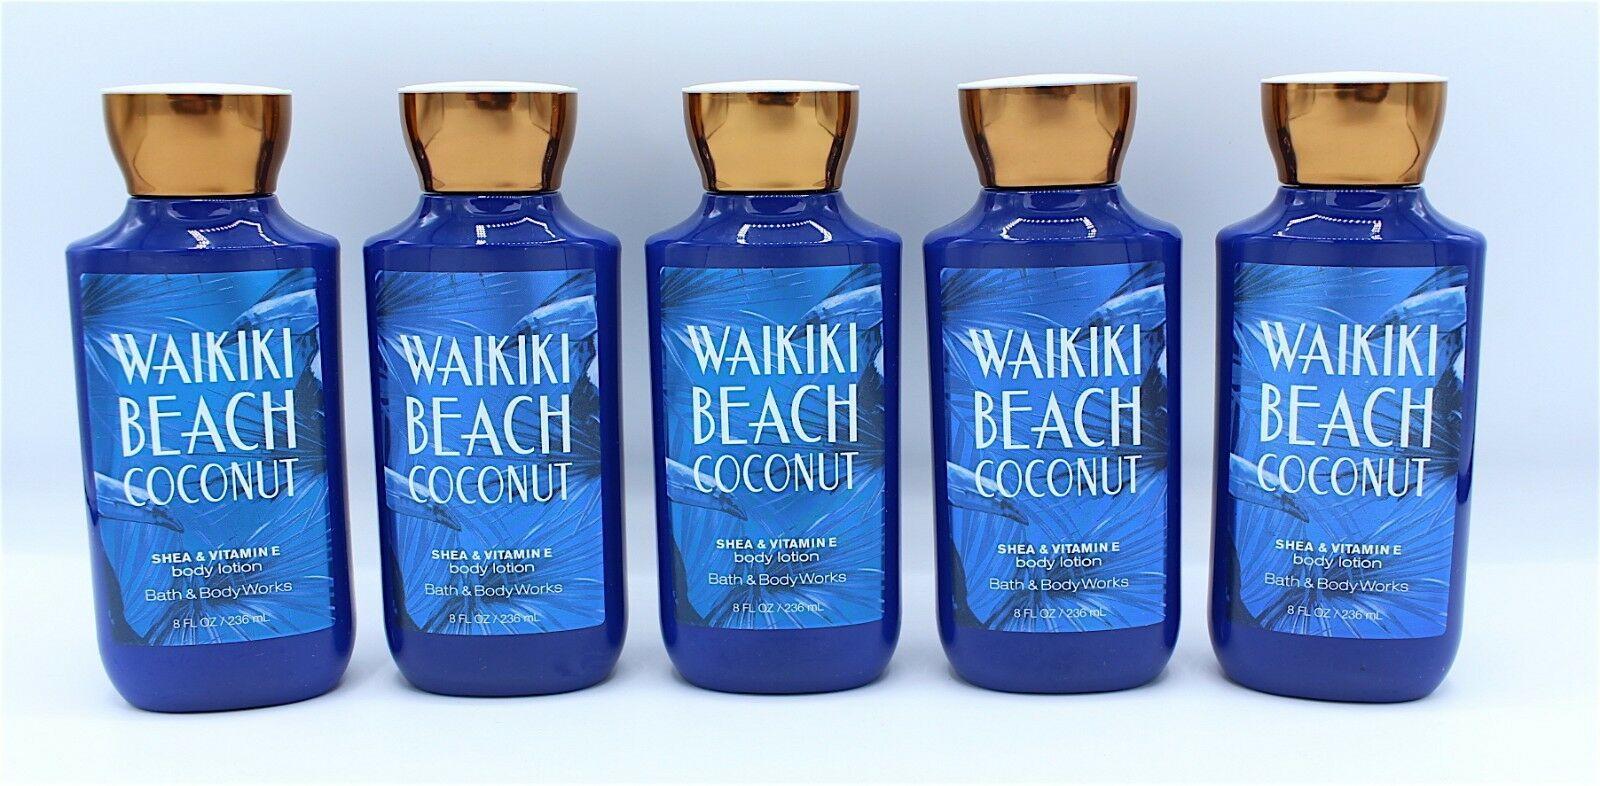 Bath & Body Works Waikiki Beach Coconut Body Lotion Lot of 5 Bottles